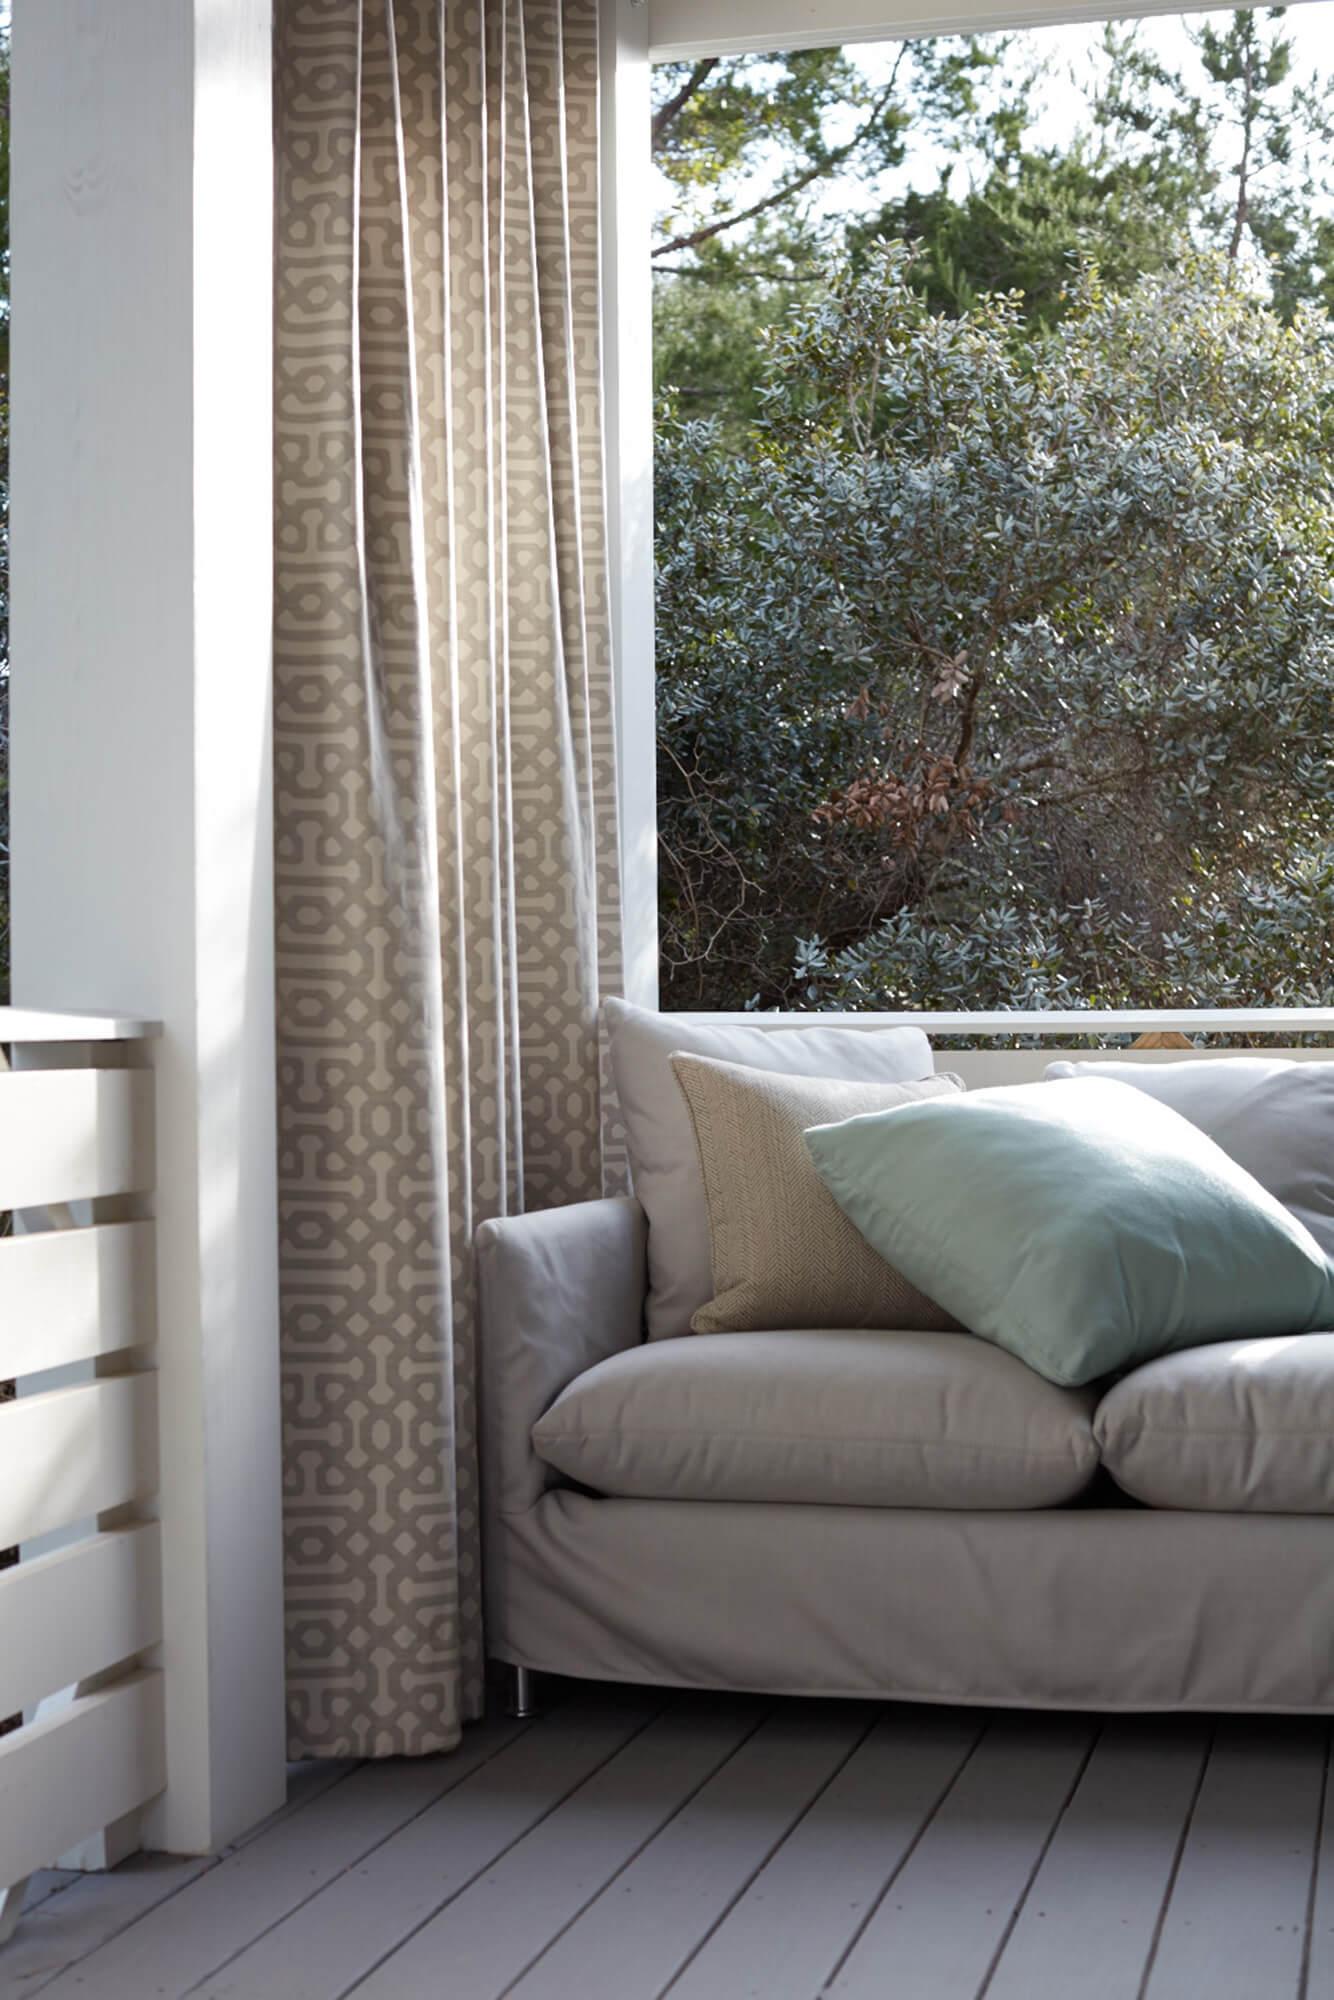 Sunbrella Fretwork Pewter 户外挂帘为放着精美抱枕的白色沙发提供遮挡